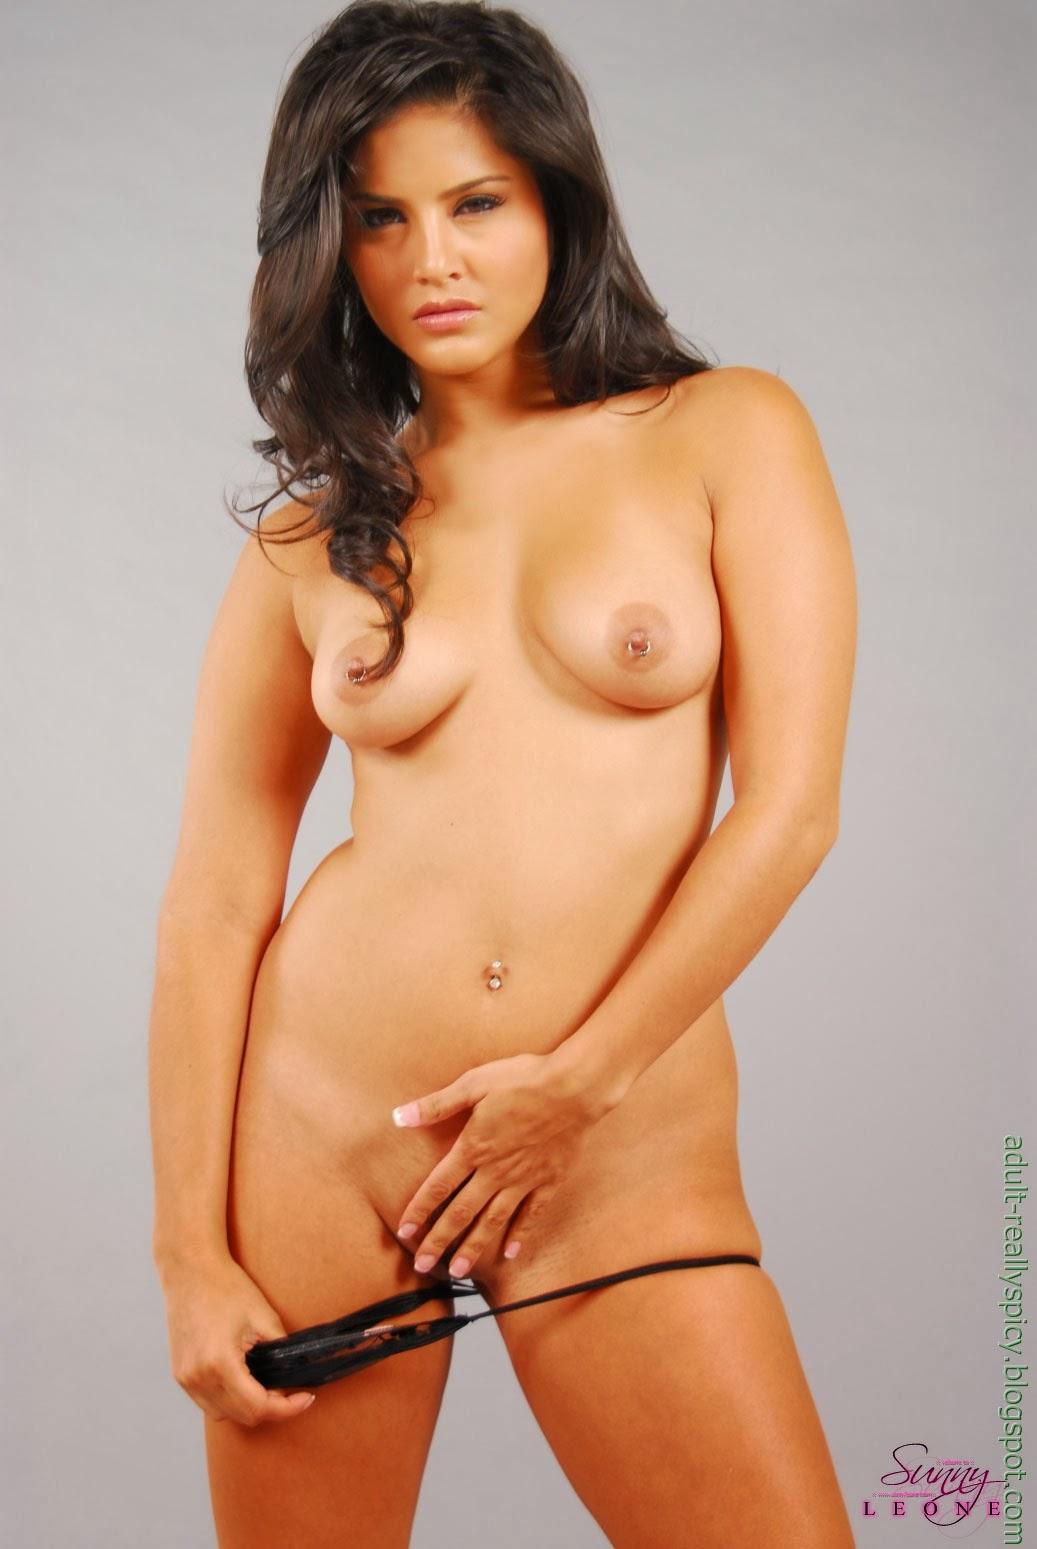 Kyla pratt fake nude, bumper cheney dick sticker